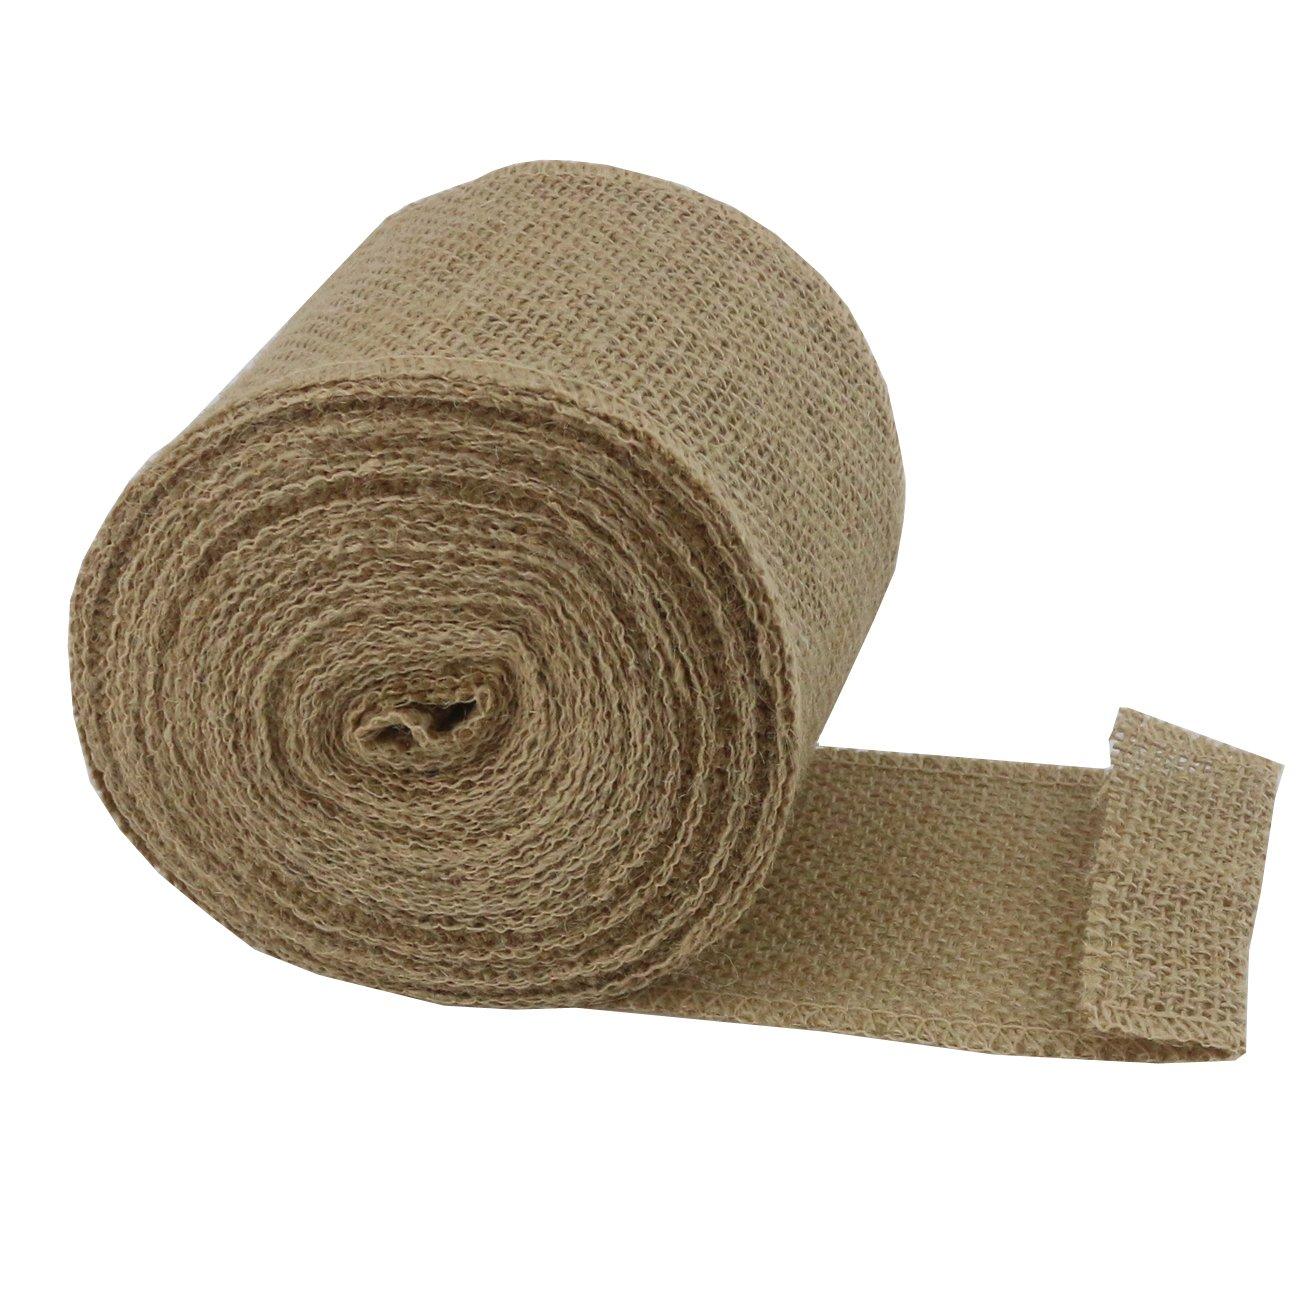 Ogrmar 3.15 Inch Wide Rustic Wedding Natural Jute Burlap Ribbon Fabric Hessian Linen Roll Gift Wrap Tablecloth (Brown)